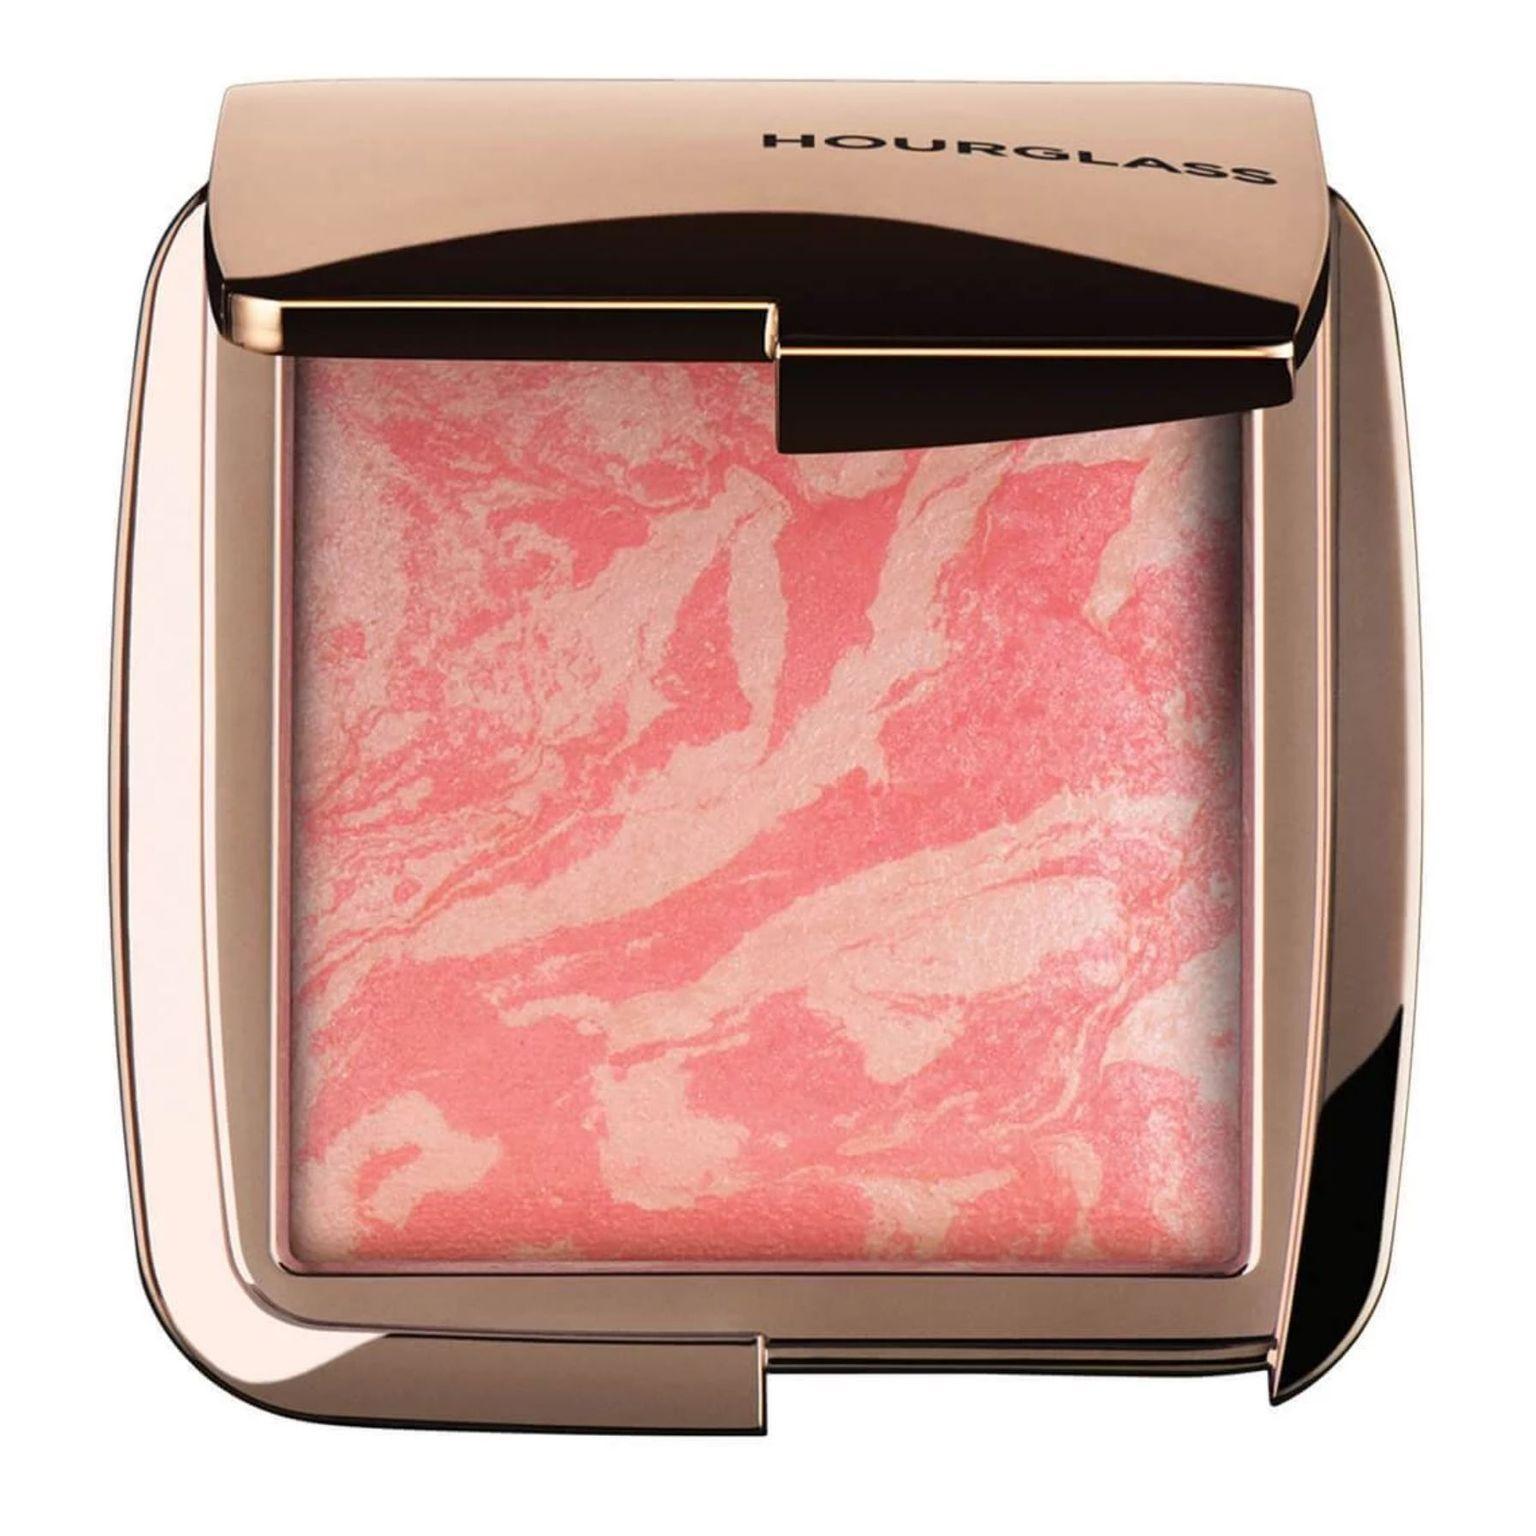 Ambient Strobe Lighting Blush - Incandescent Electra